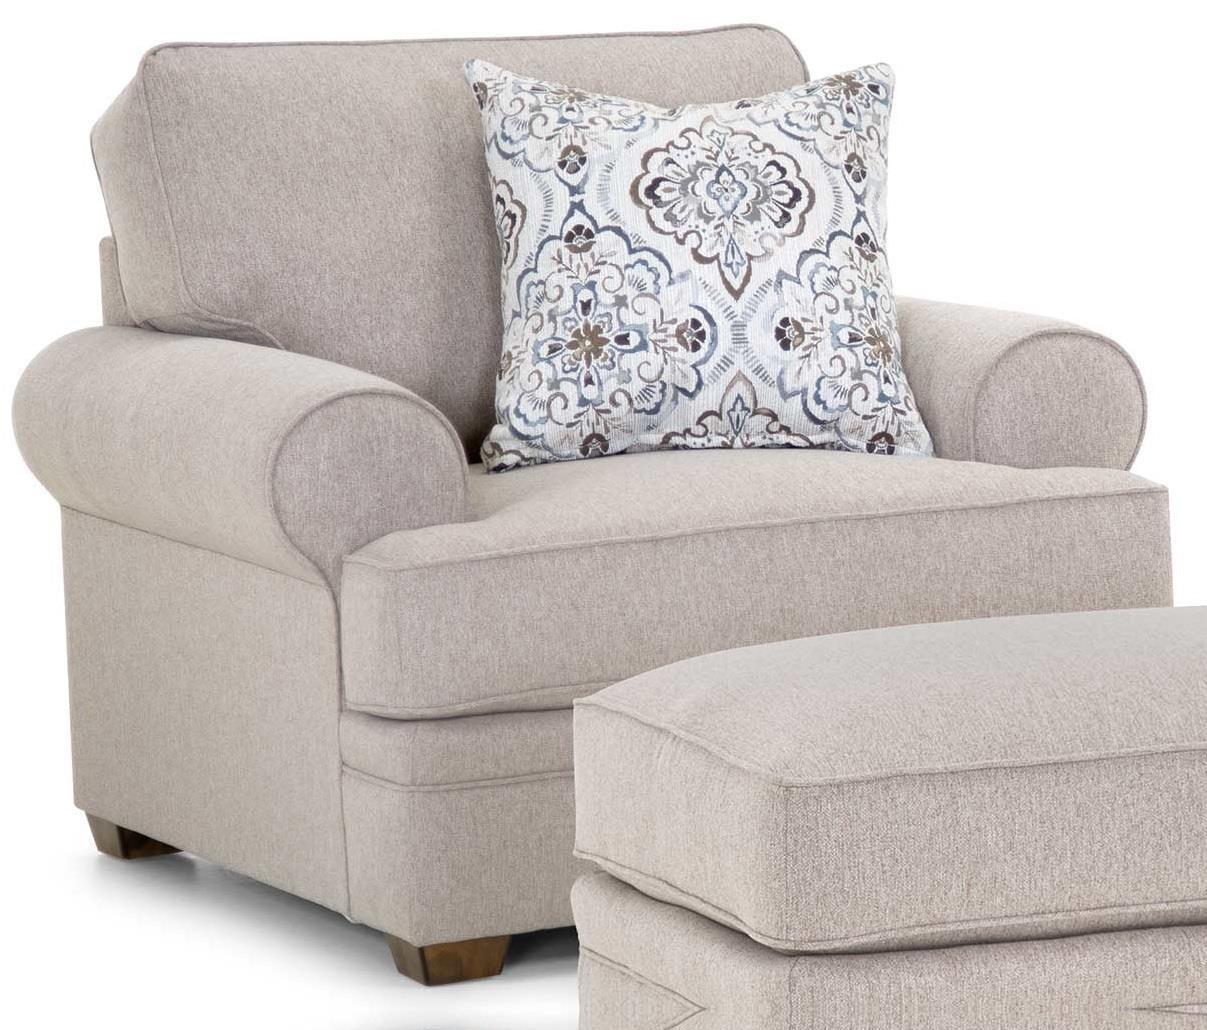 Anniston Chair & a Half at Bennett's Furniture and Mattresses